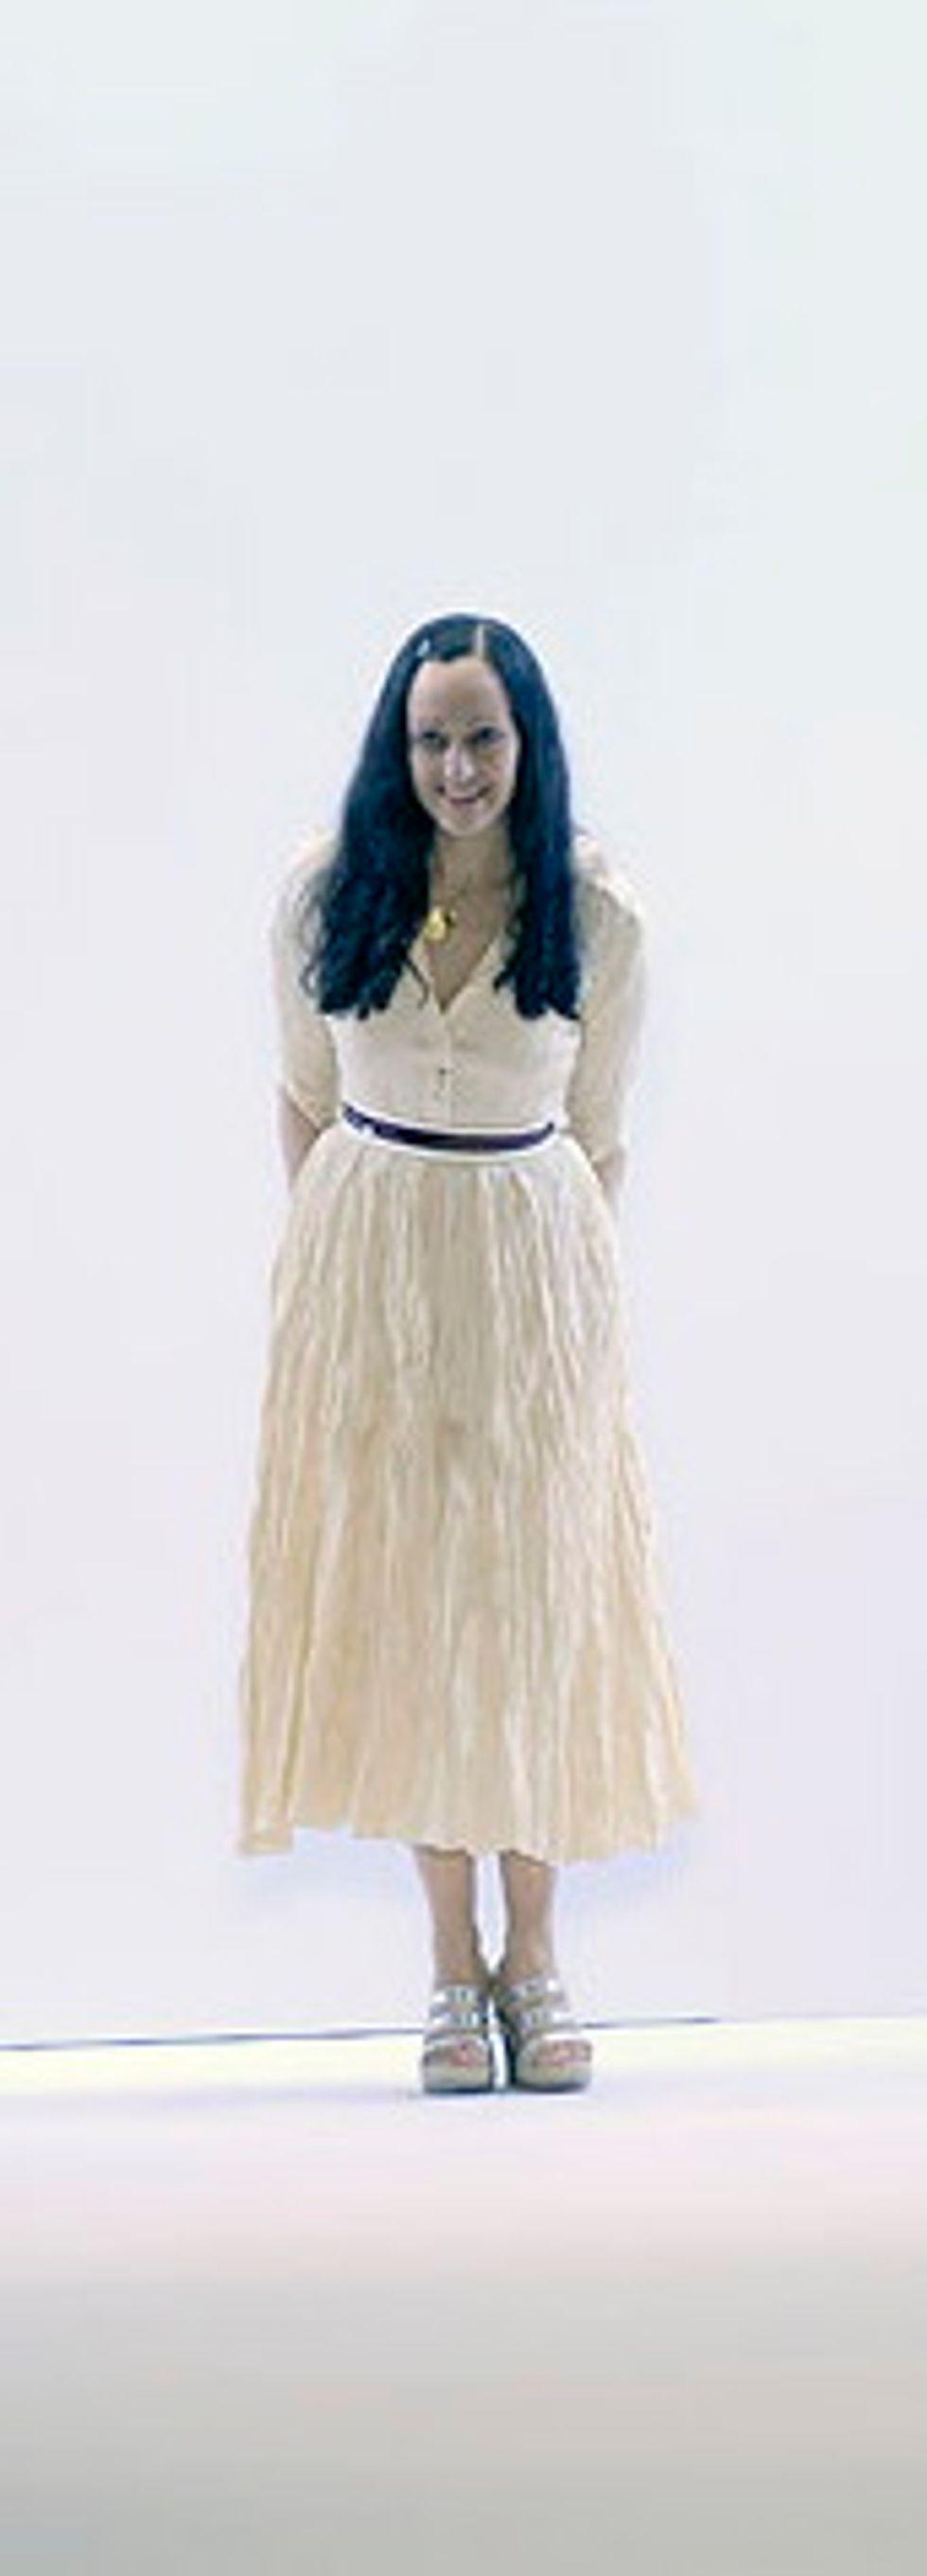 My New Favorite Dress